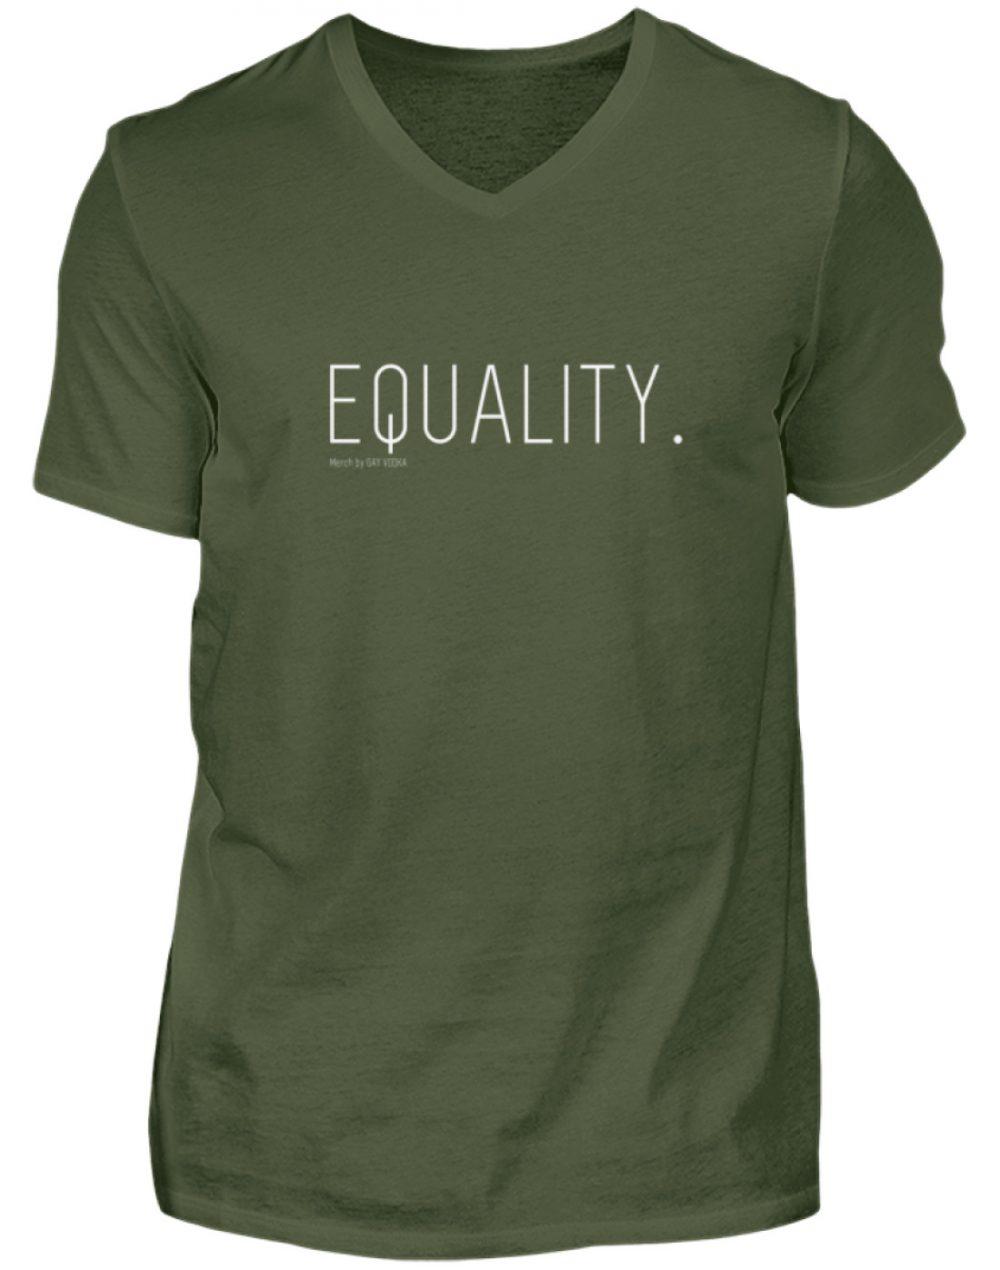 EQUALITY. - Herren V-Neck Shirt-2587